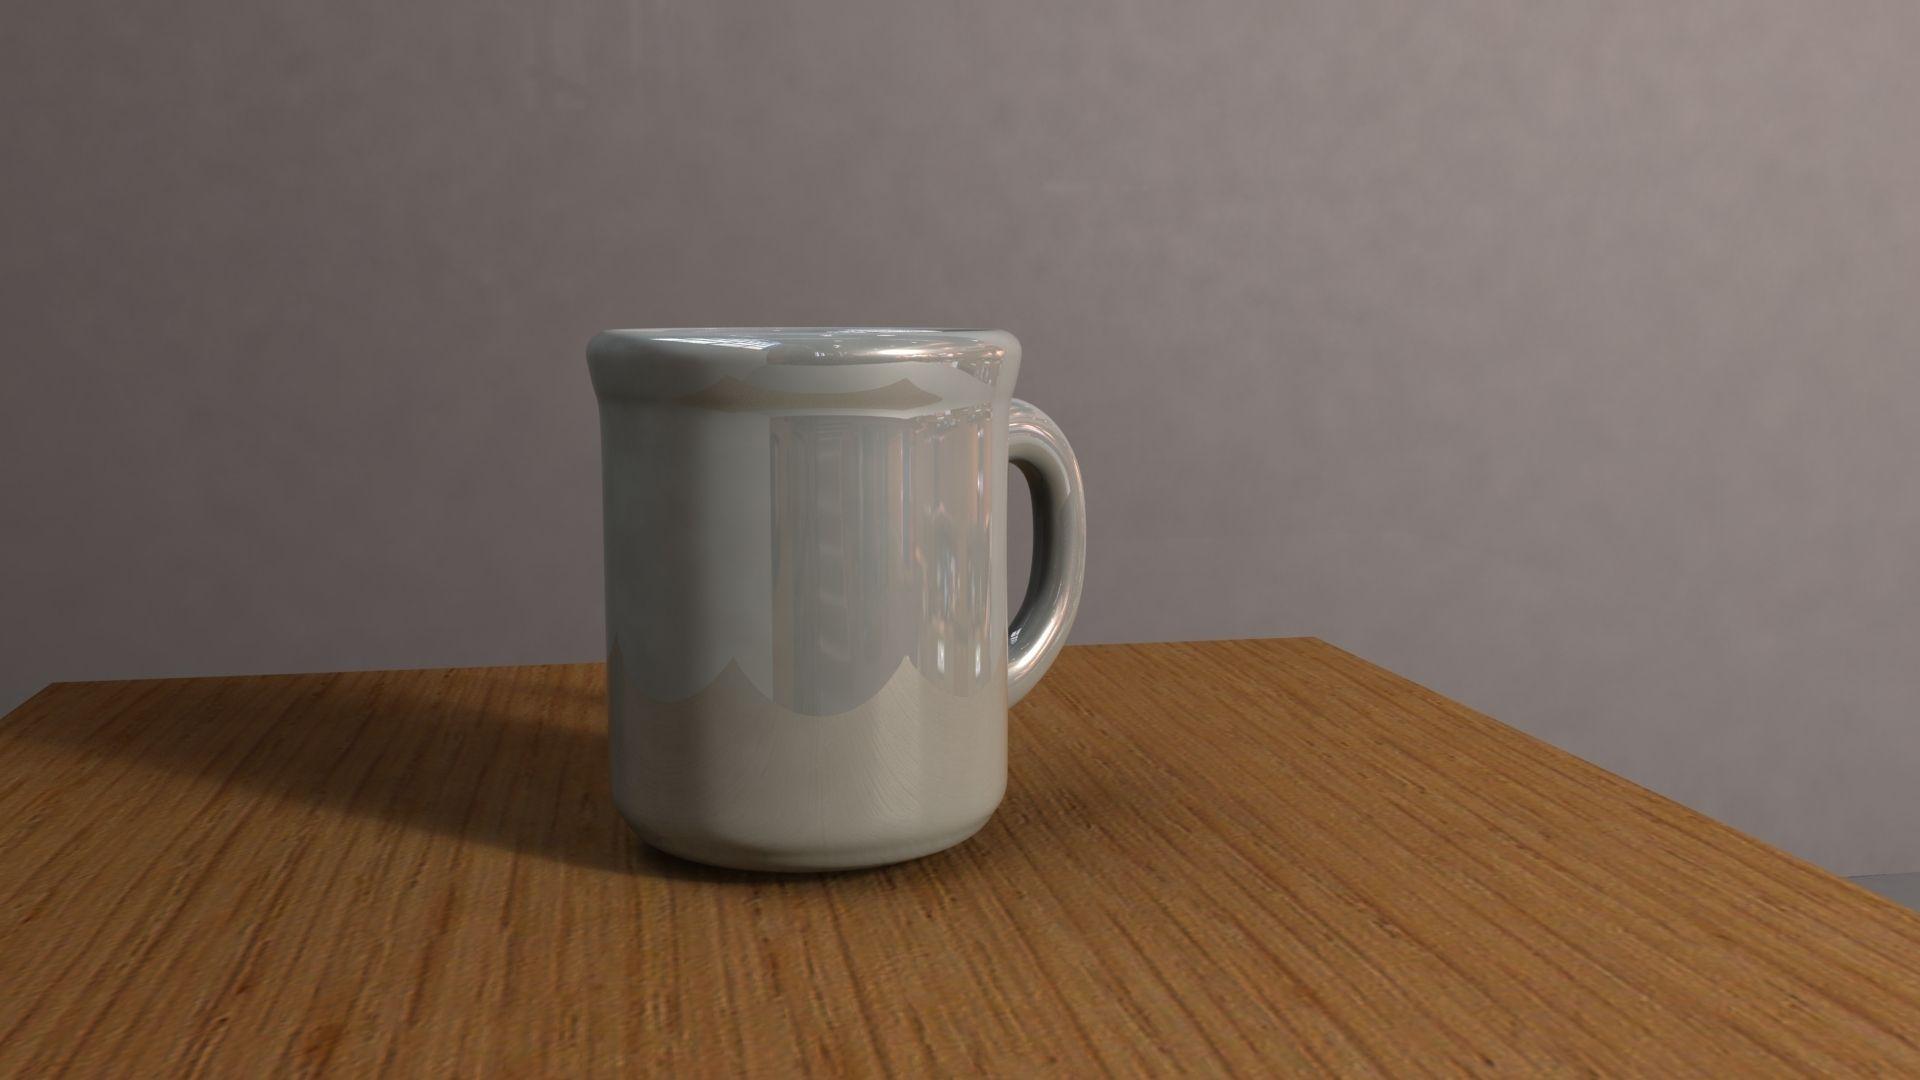 One Mug Coffee Maker Model Wm 6101 : Coffee Mug 3D Model MA MB CGTrader.com